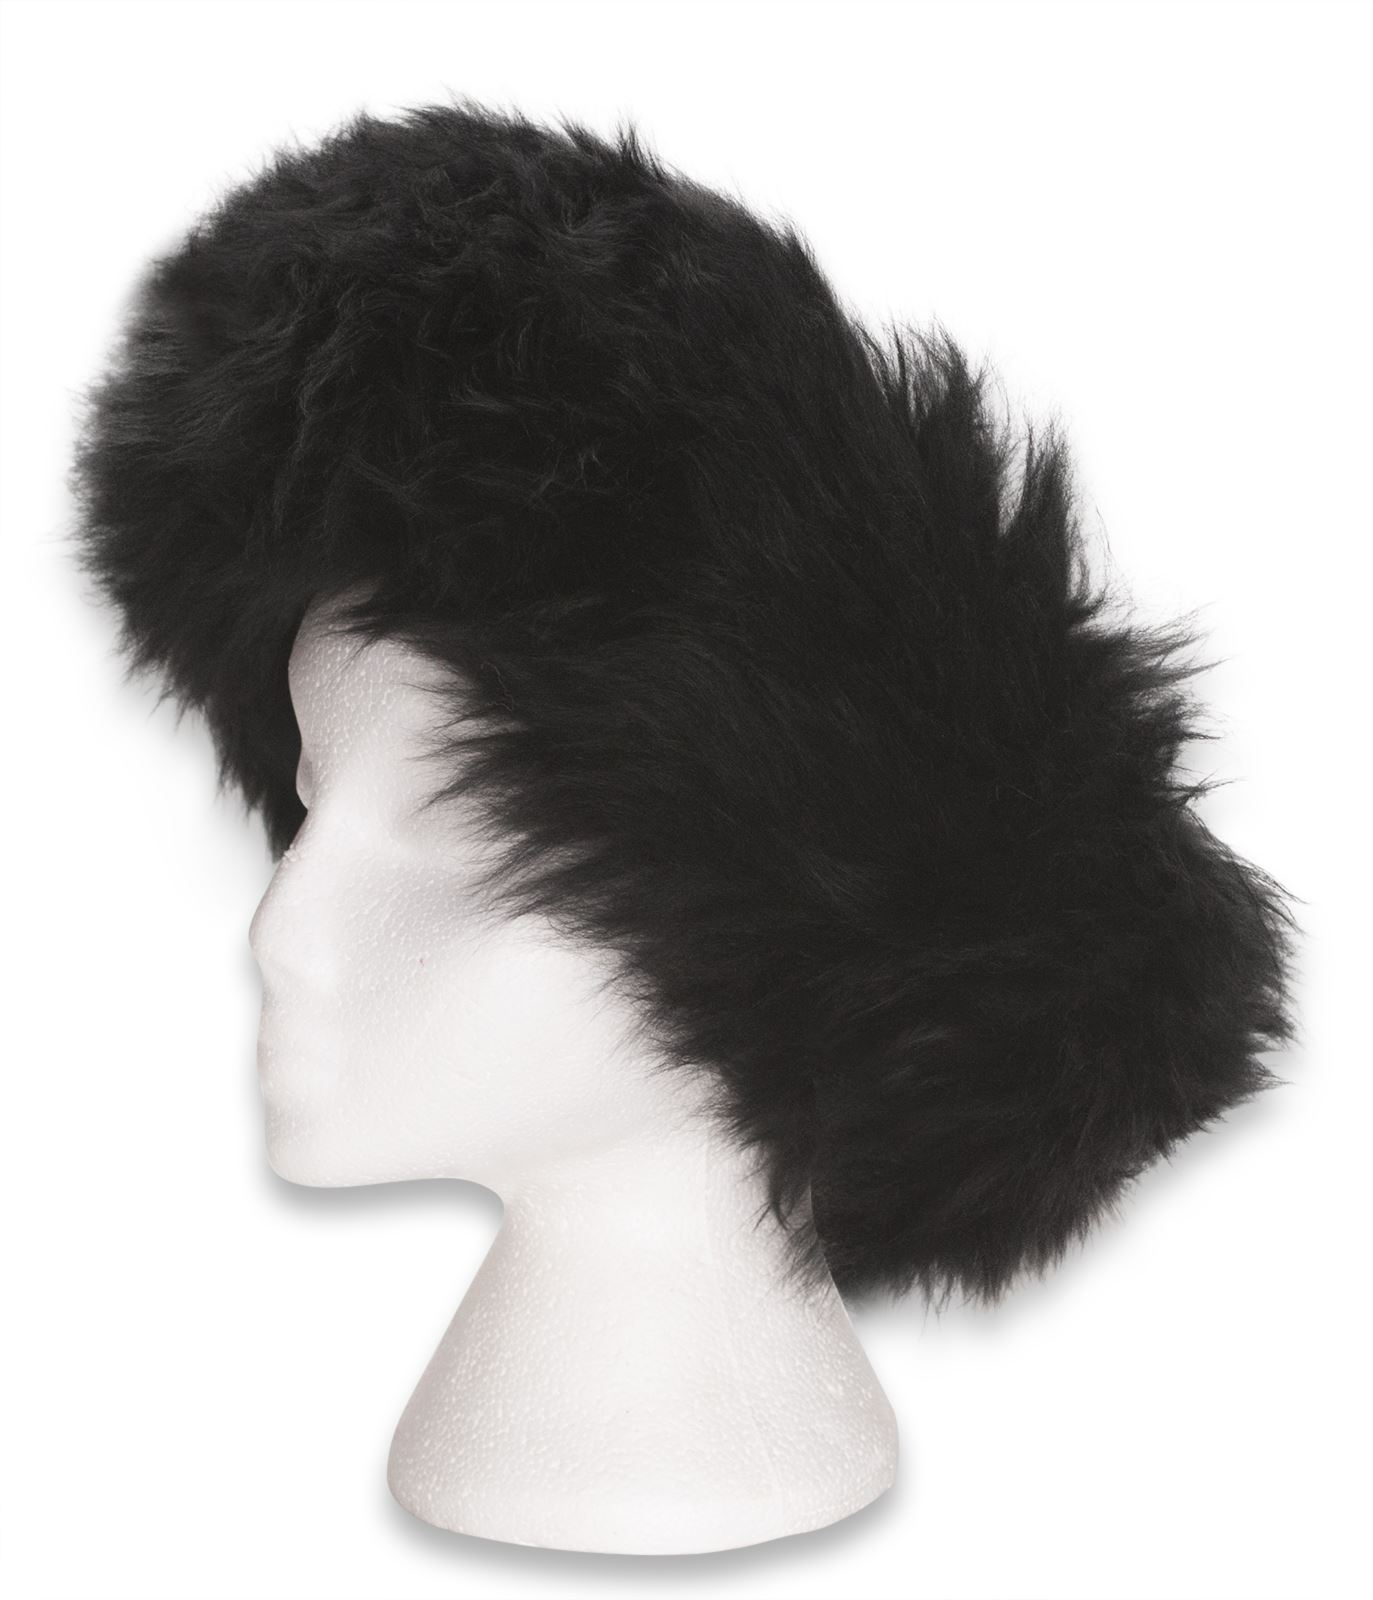 nordvek peau de mouton v ritable lastique bandeau t te bande mesdames femmes. Black Bedroom Furniture Sets. Home Design Ideas